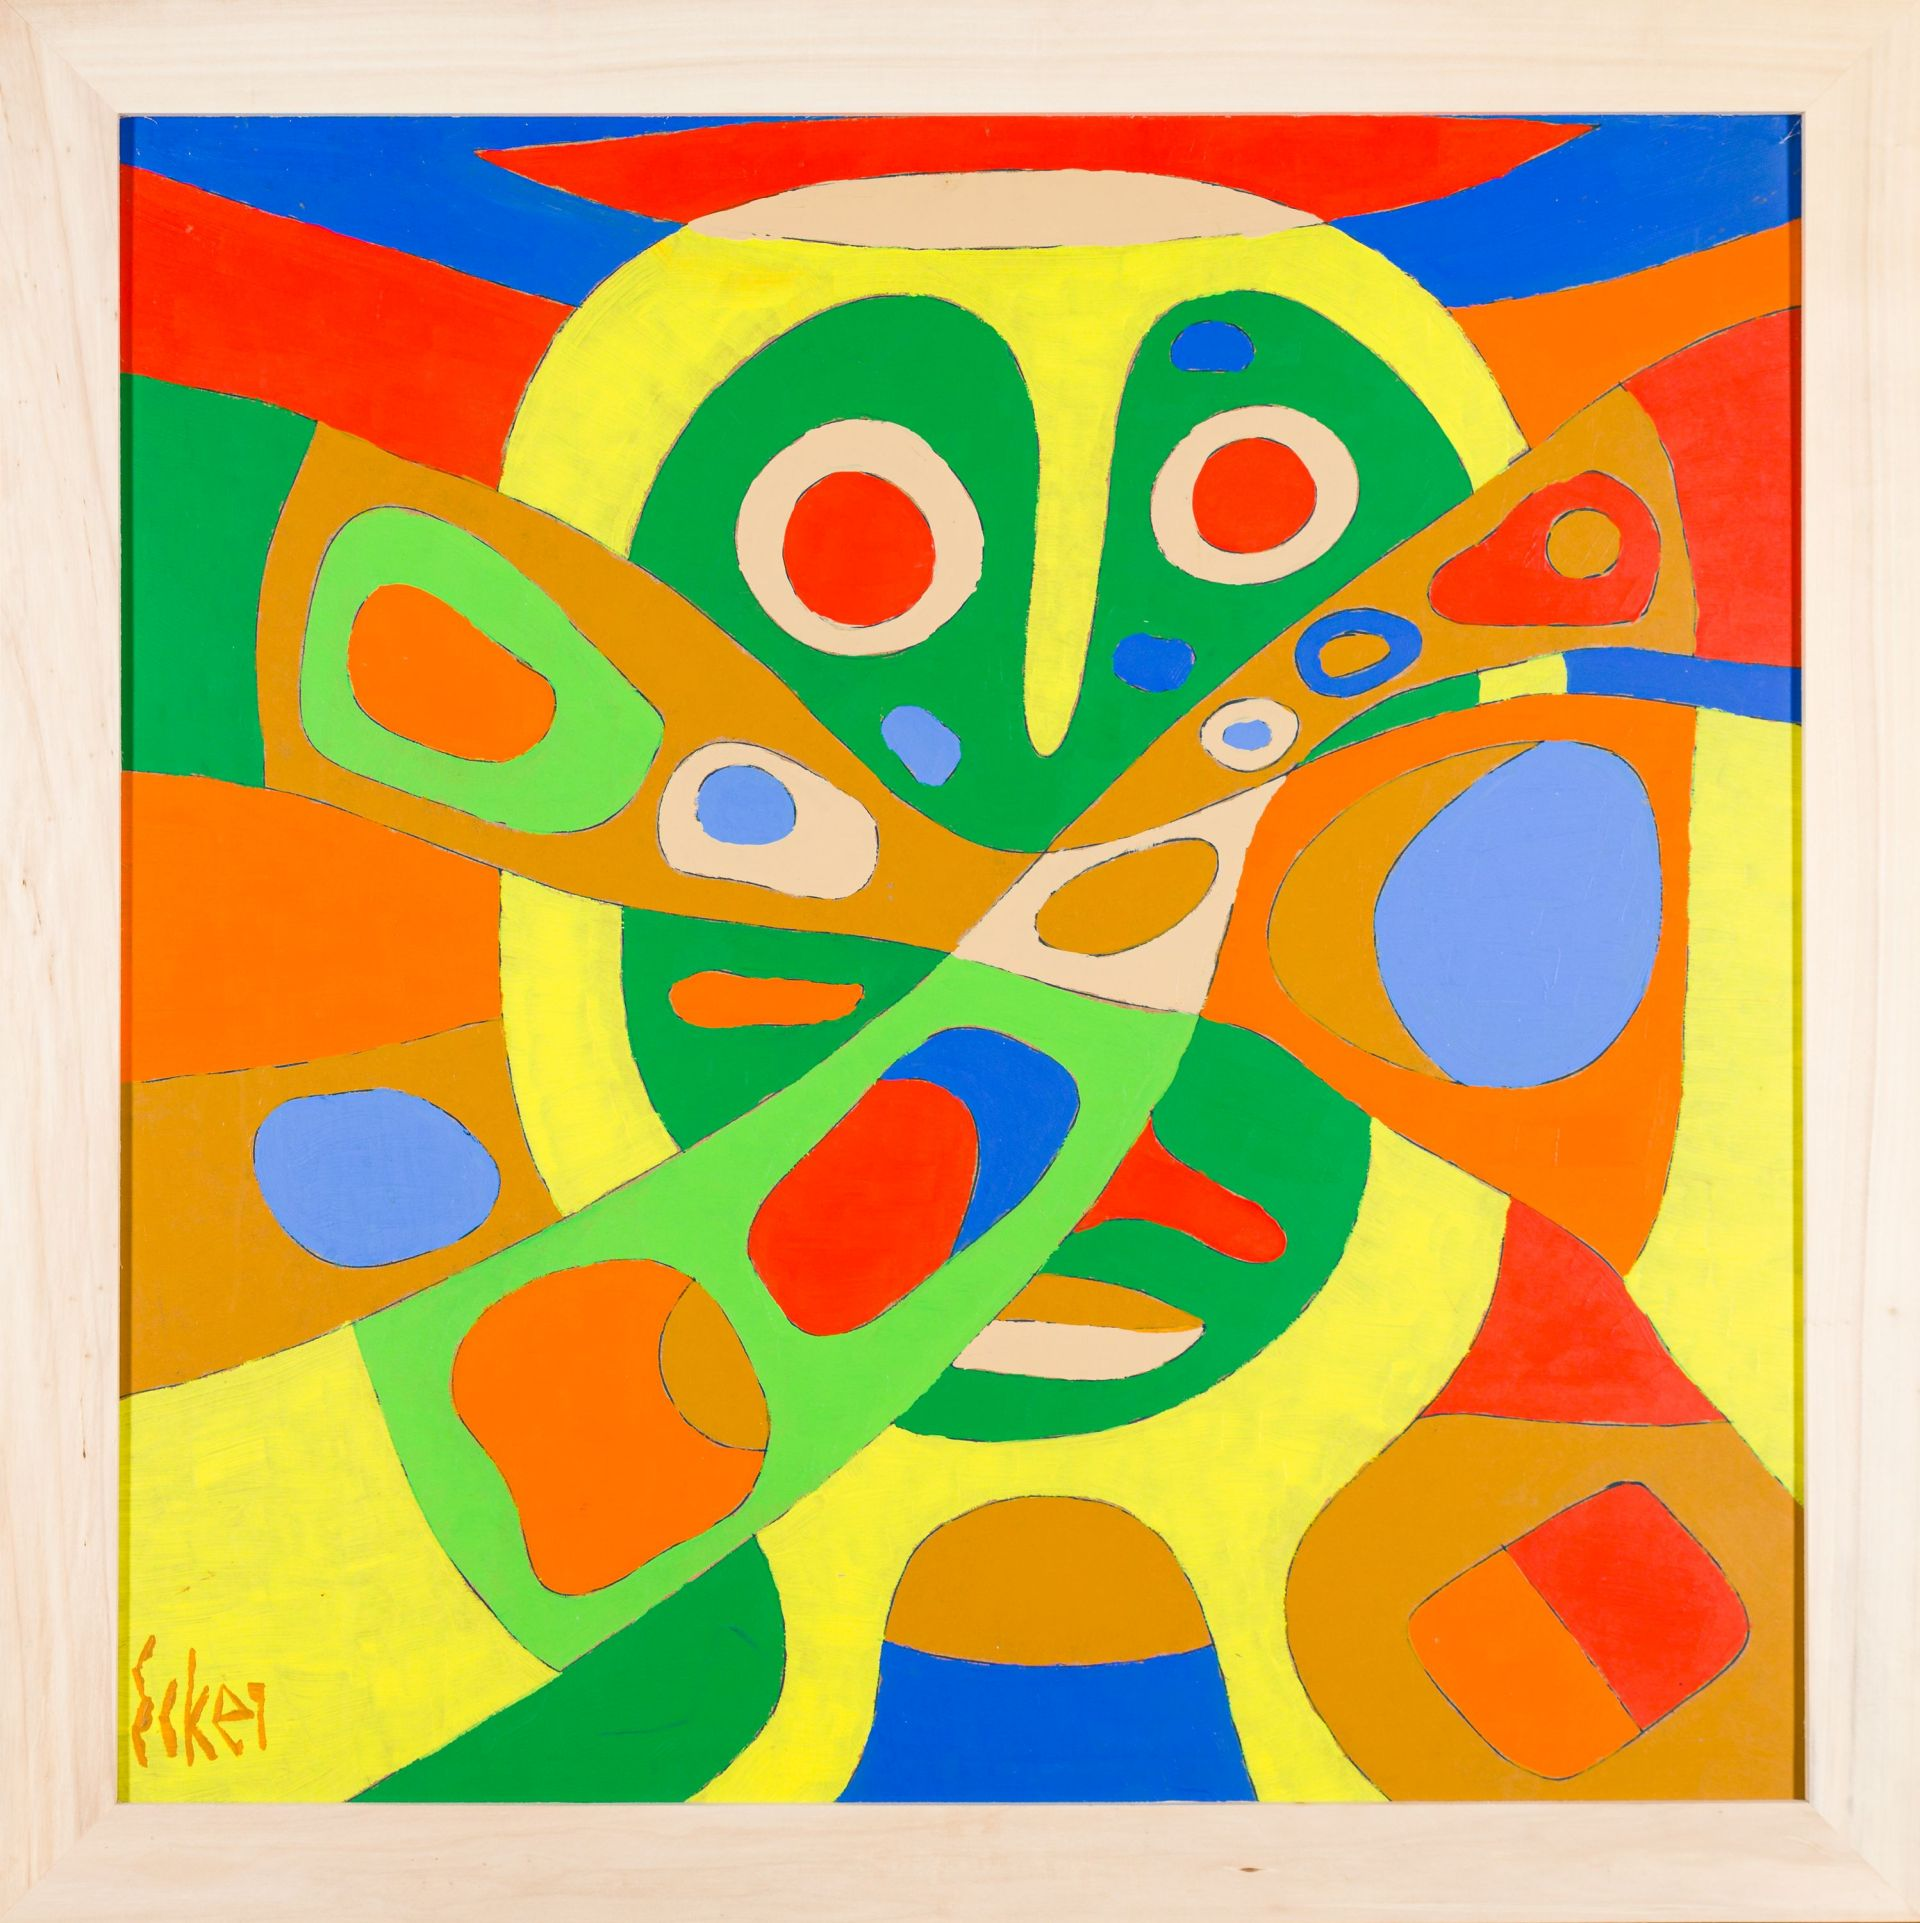 Franz Ecker-Abstraction